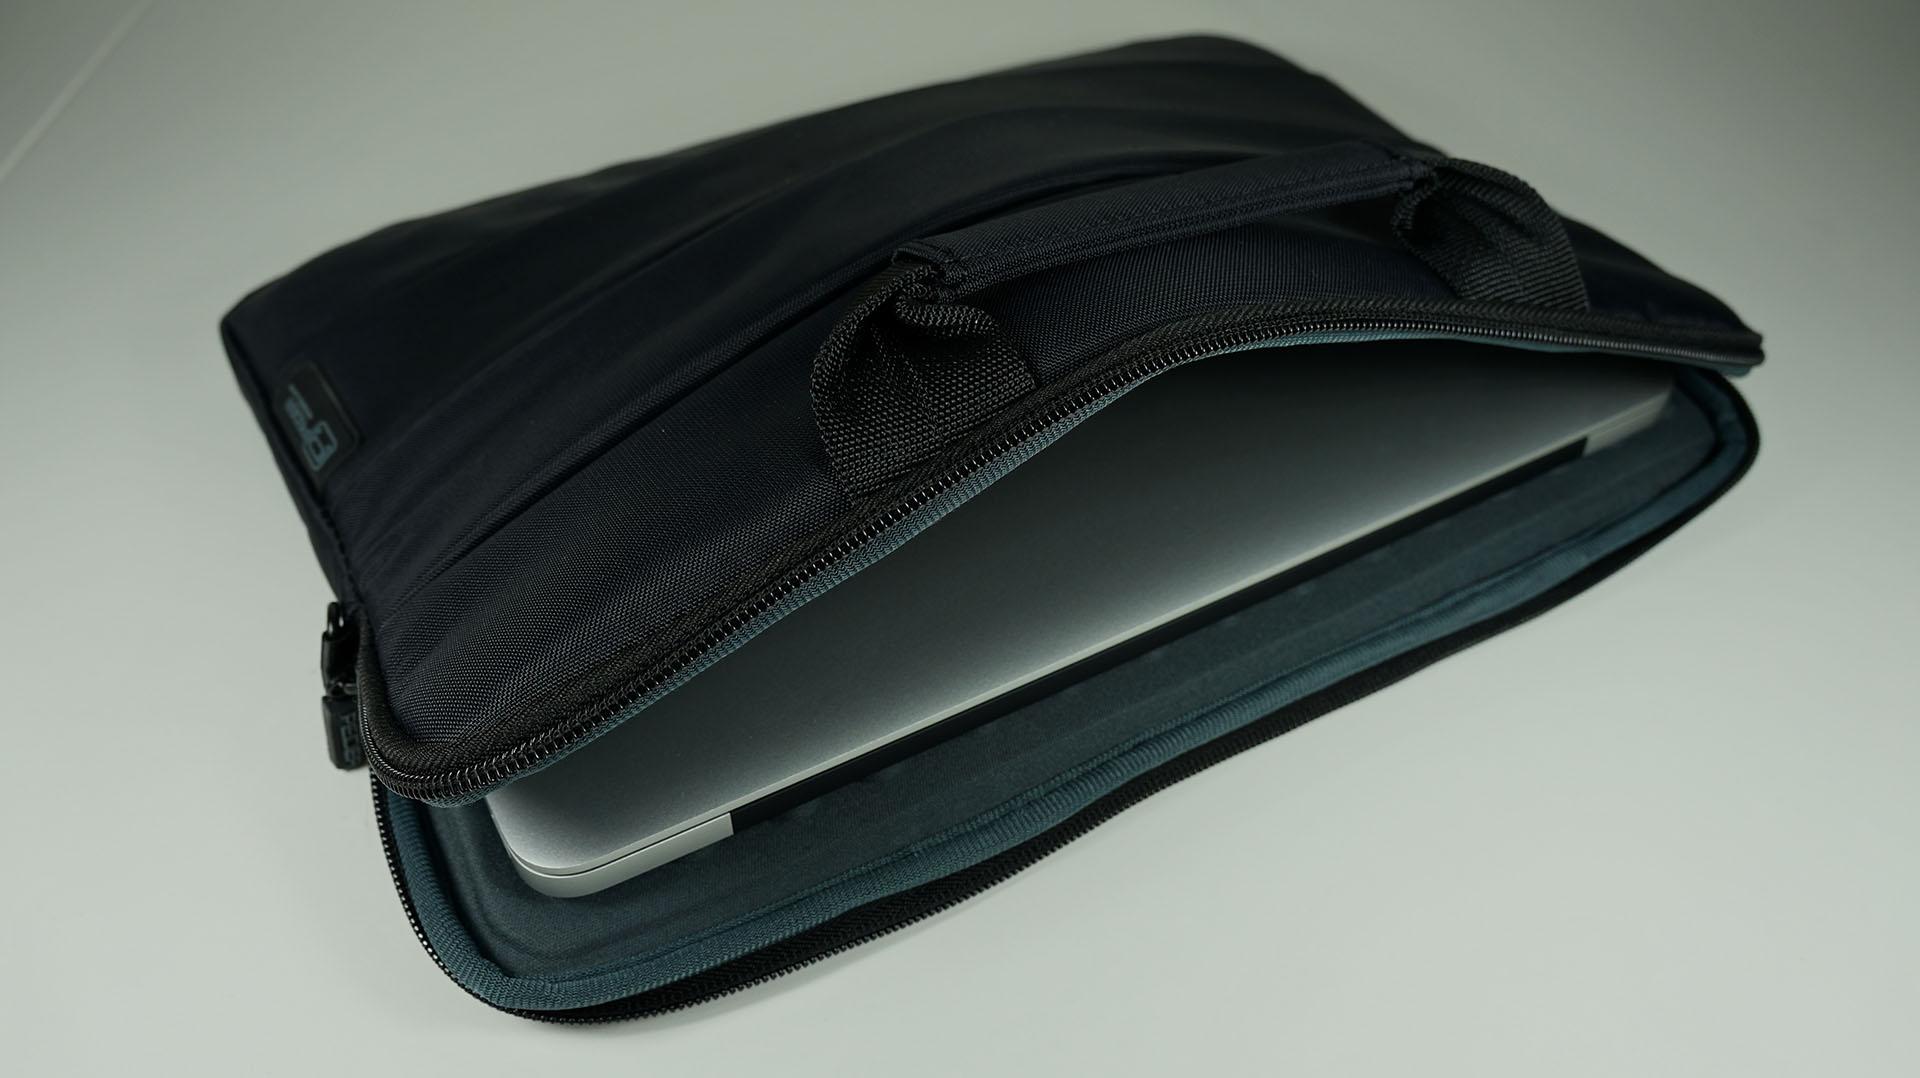 jisoncase elegant macbook air pro retina 13 3 zoll h lle weich schlank ultrabook laptop leder. Black Bedroom Furniture Sets. Home Design Ideas